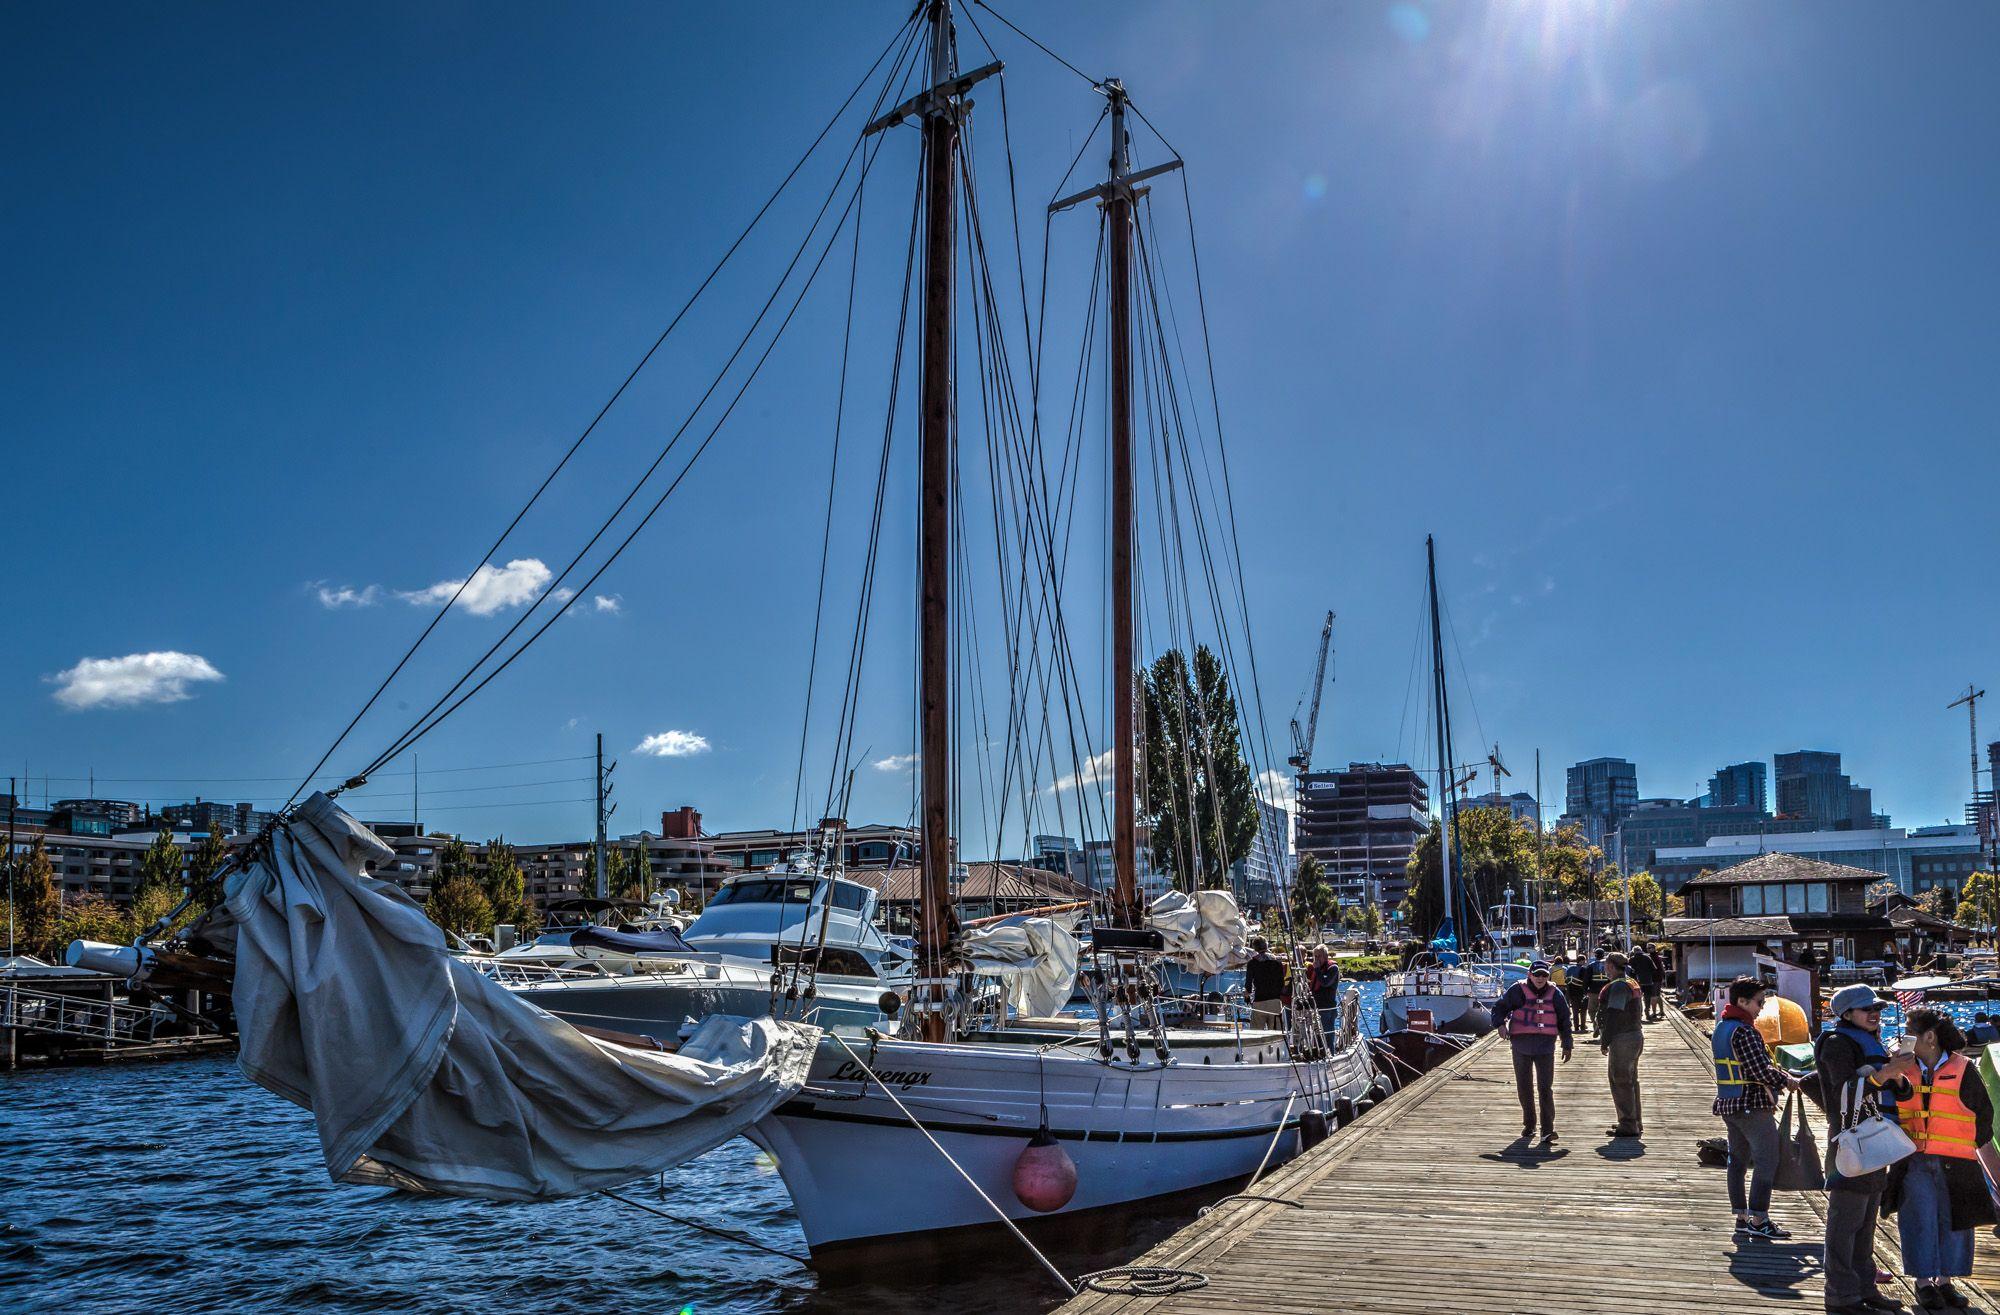 Take a free sailing trip on Lake Union in Seattle